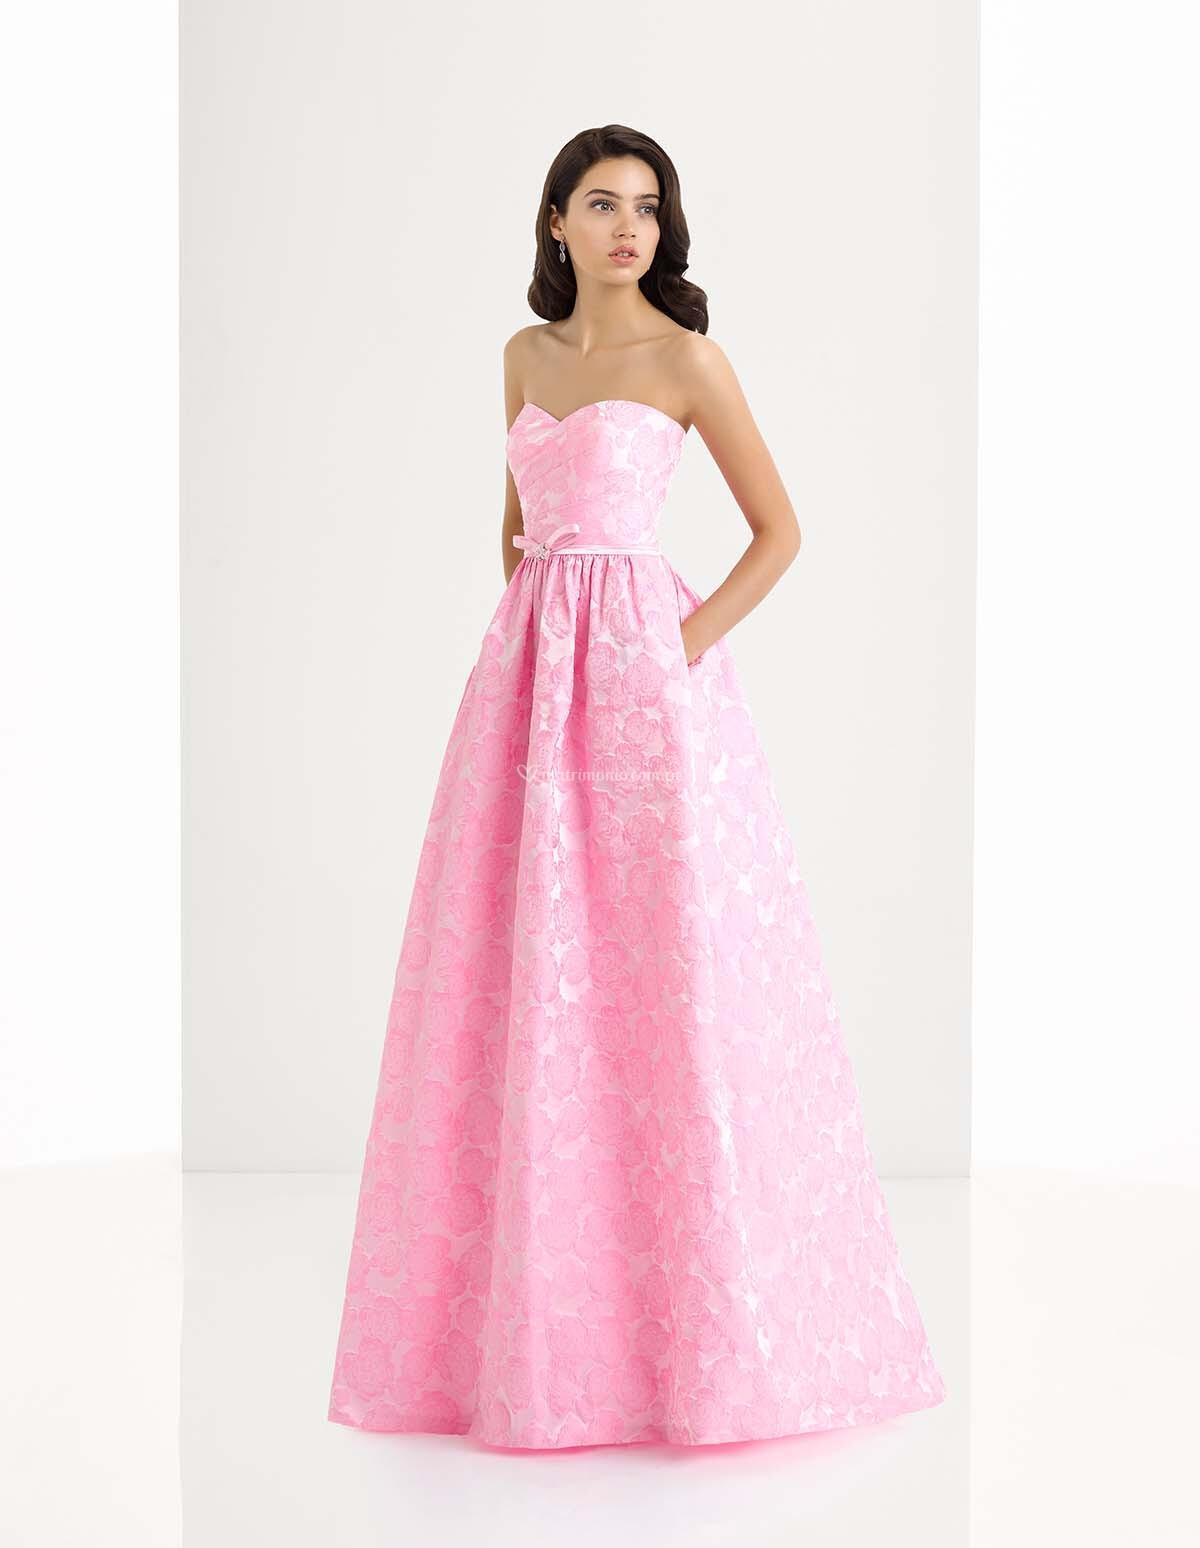 Asombroso Previamente Desgastado Vestidos De Novia Ornamento - Ideas ...